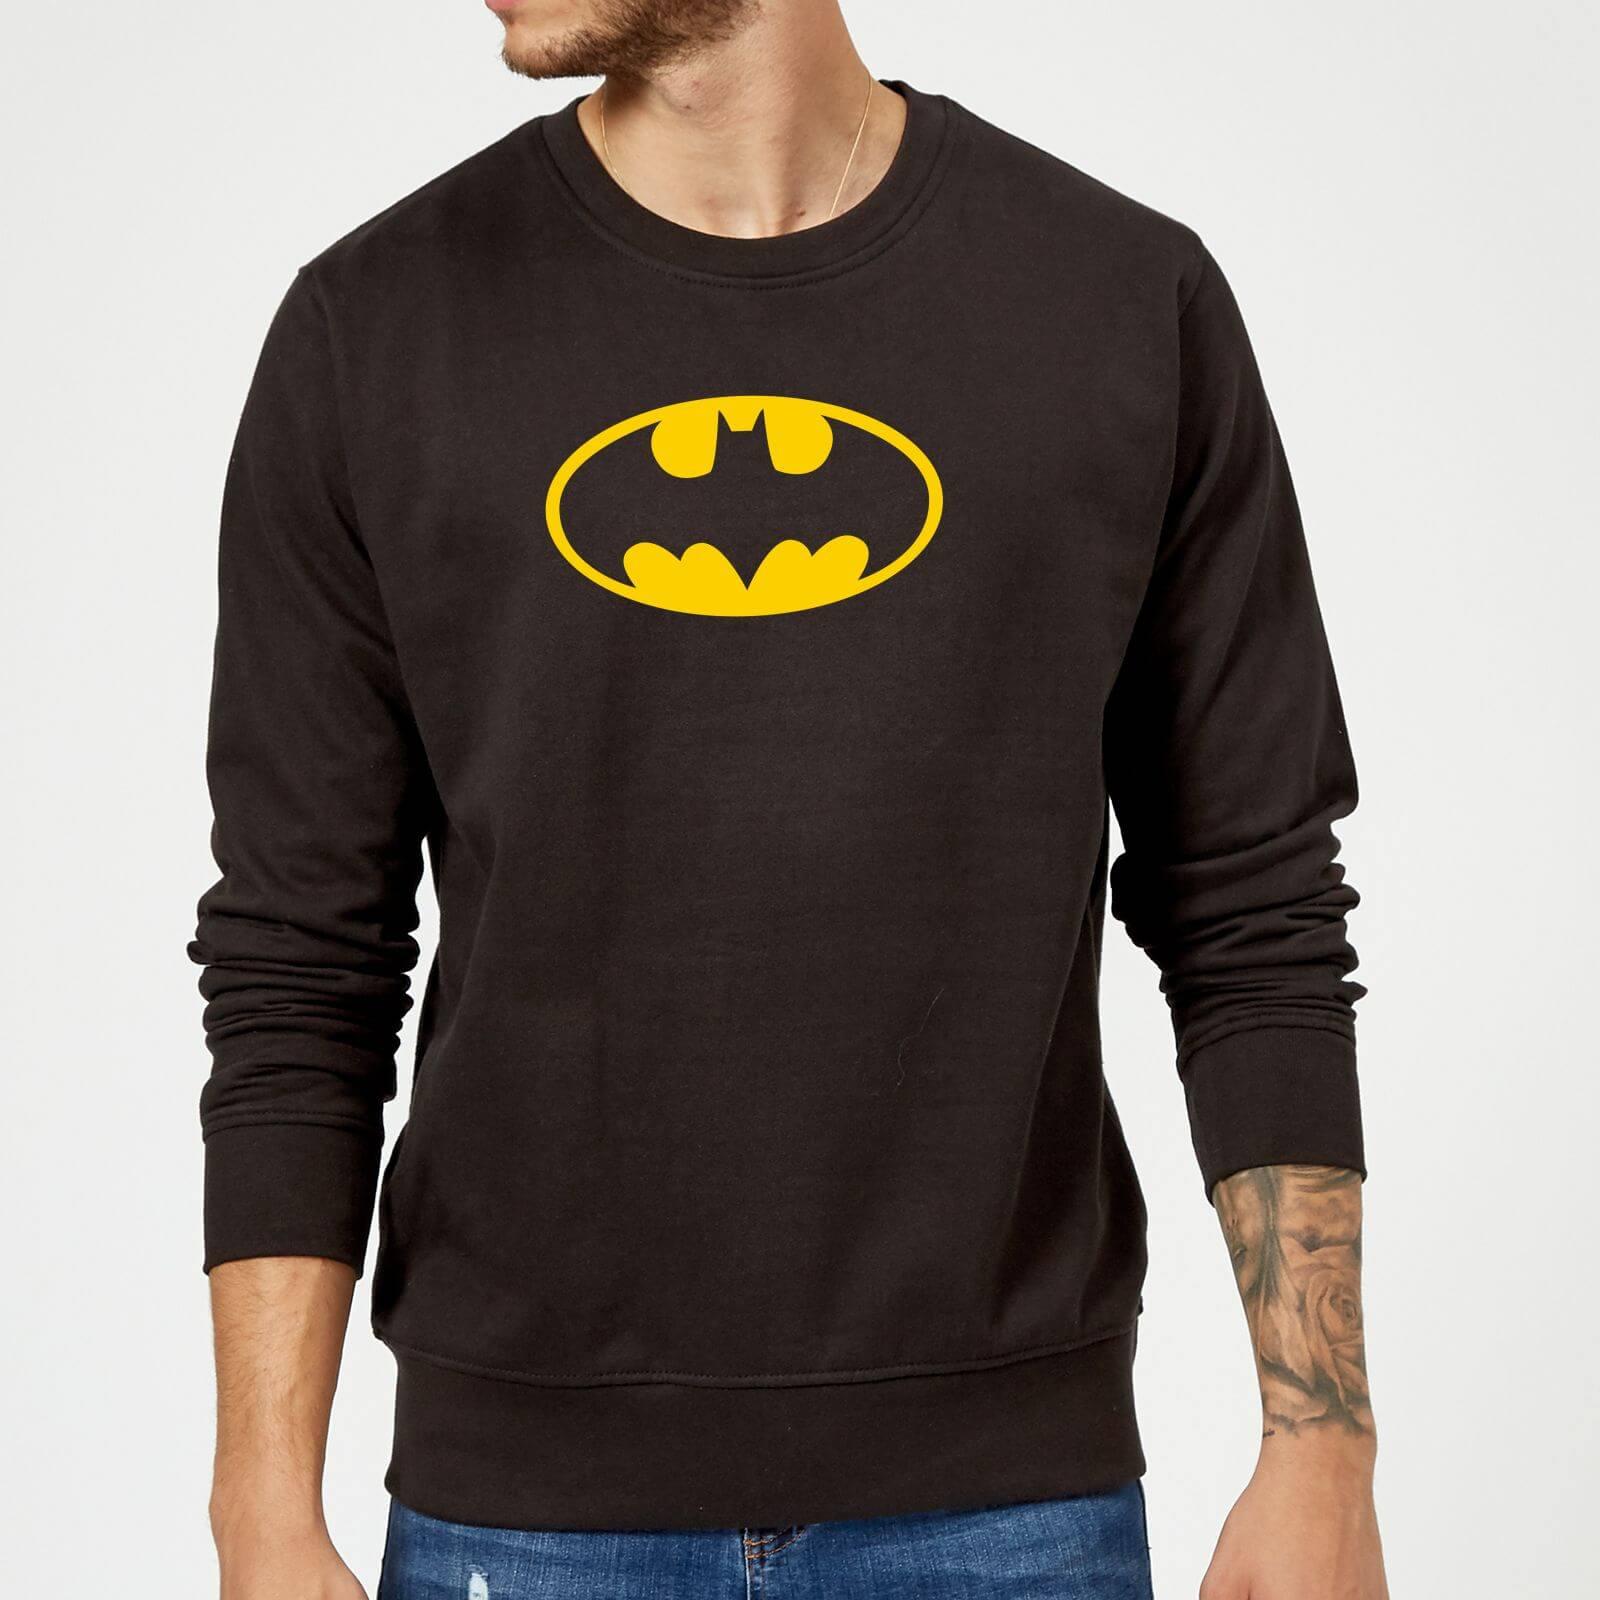 Justice League Batman Logo Sweatshirt   Black   5XL   Black